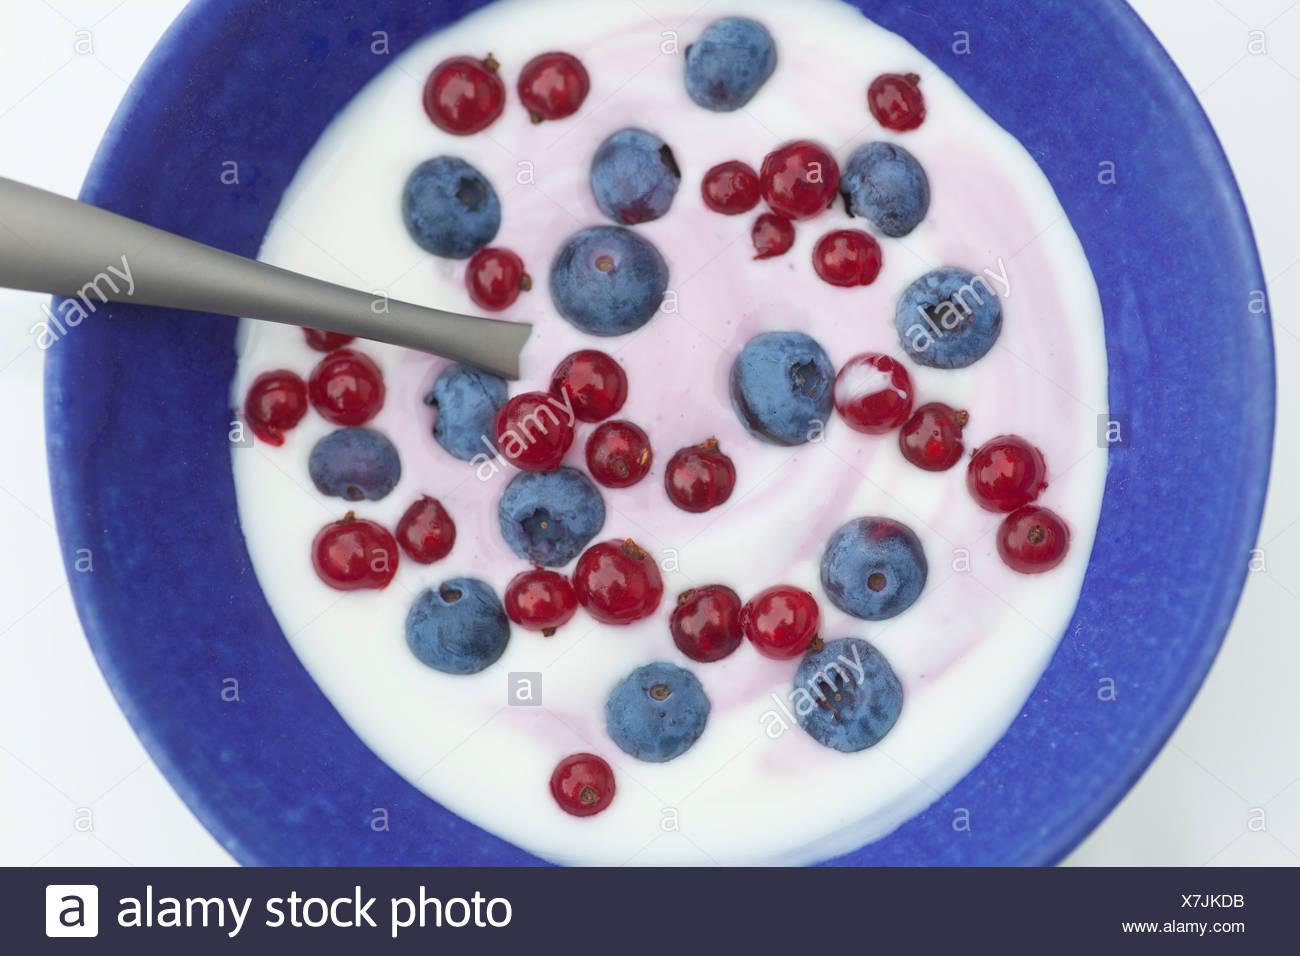 Close up of blueberries and yogurt - Stock Image